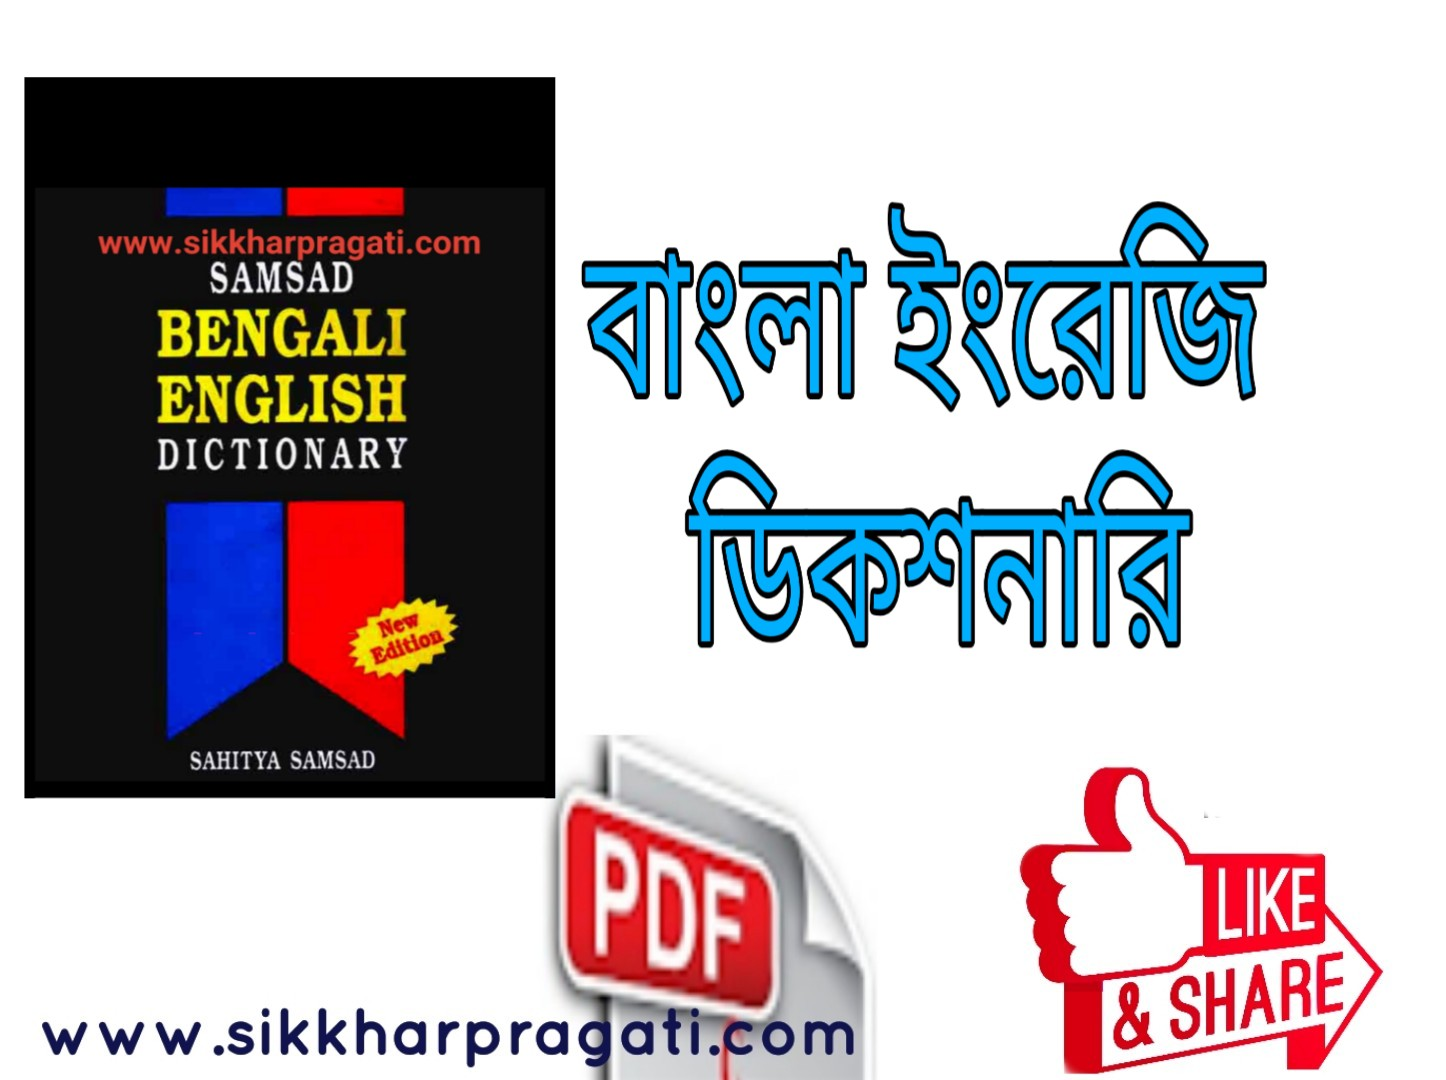 Bengali and English Dictionary pdf free - sikkharpragati com -A blog